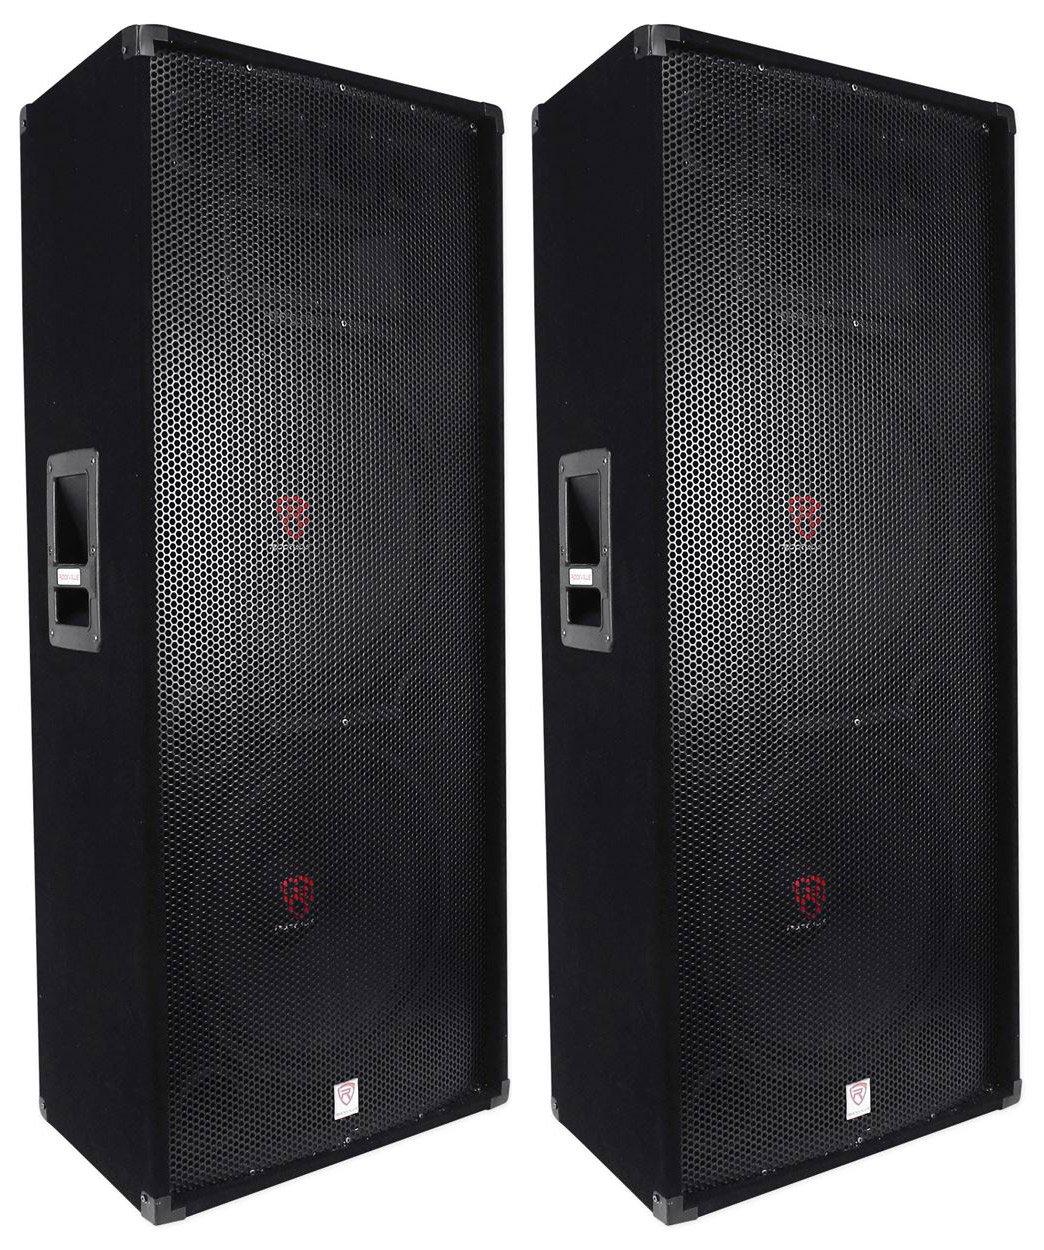 "(2) Rockville RSG15.24 Dual 15"" 3000 Watt 3-Way 4-Ohm Passive DJ / PA Speaker"